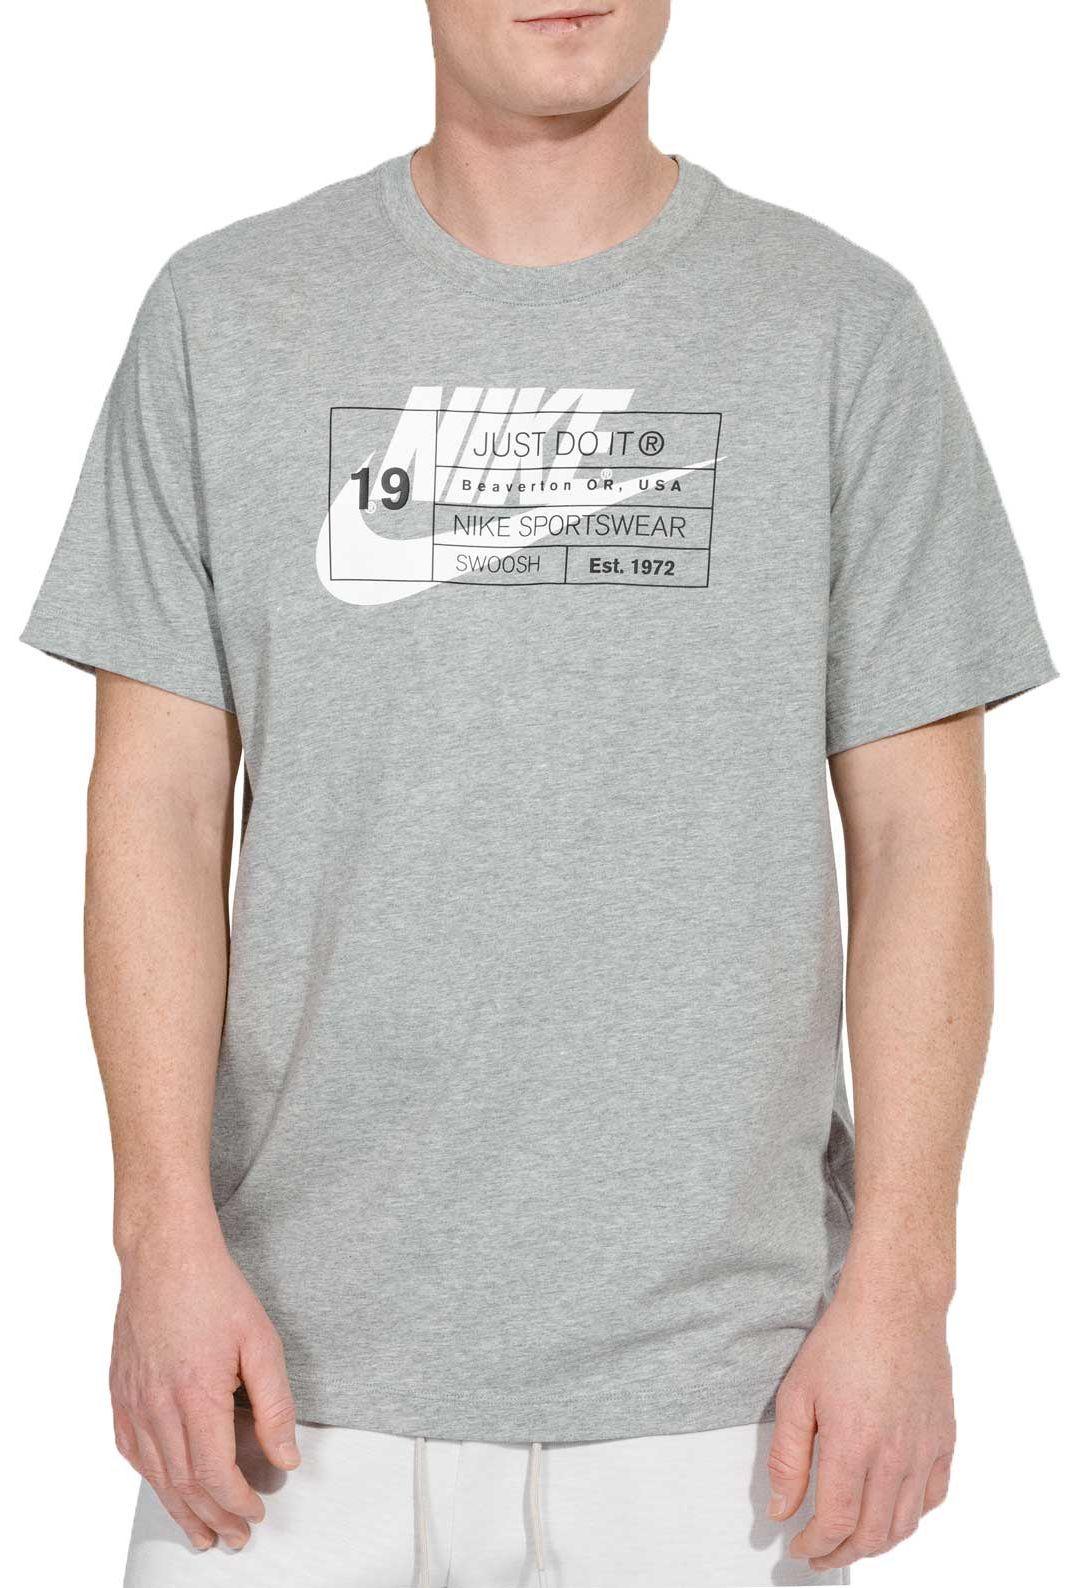 3a3ae71fa4c4 Nike Men's Sportswear Story Graphic Tee. noImageFound. Previous